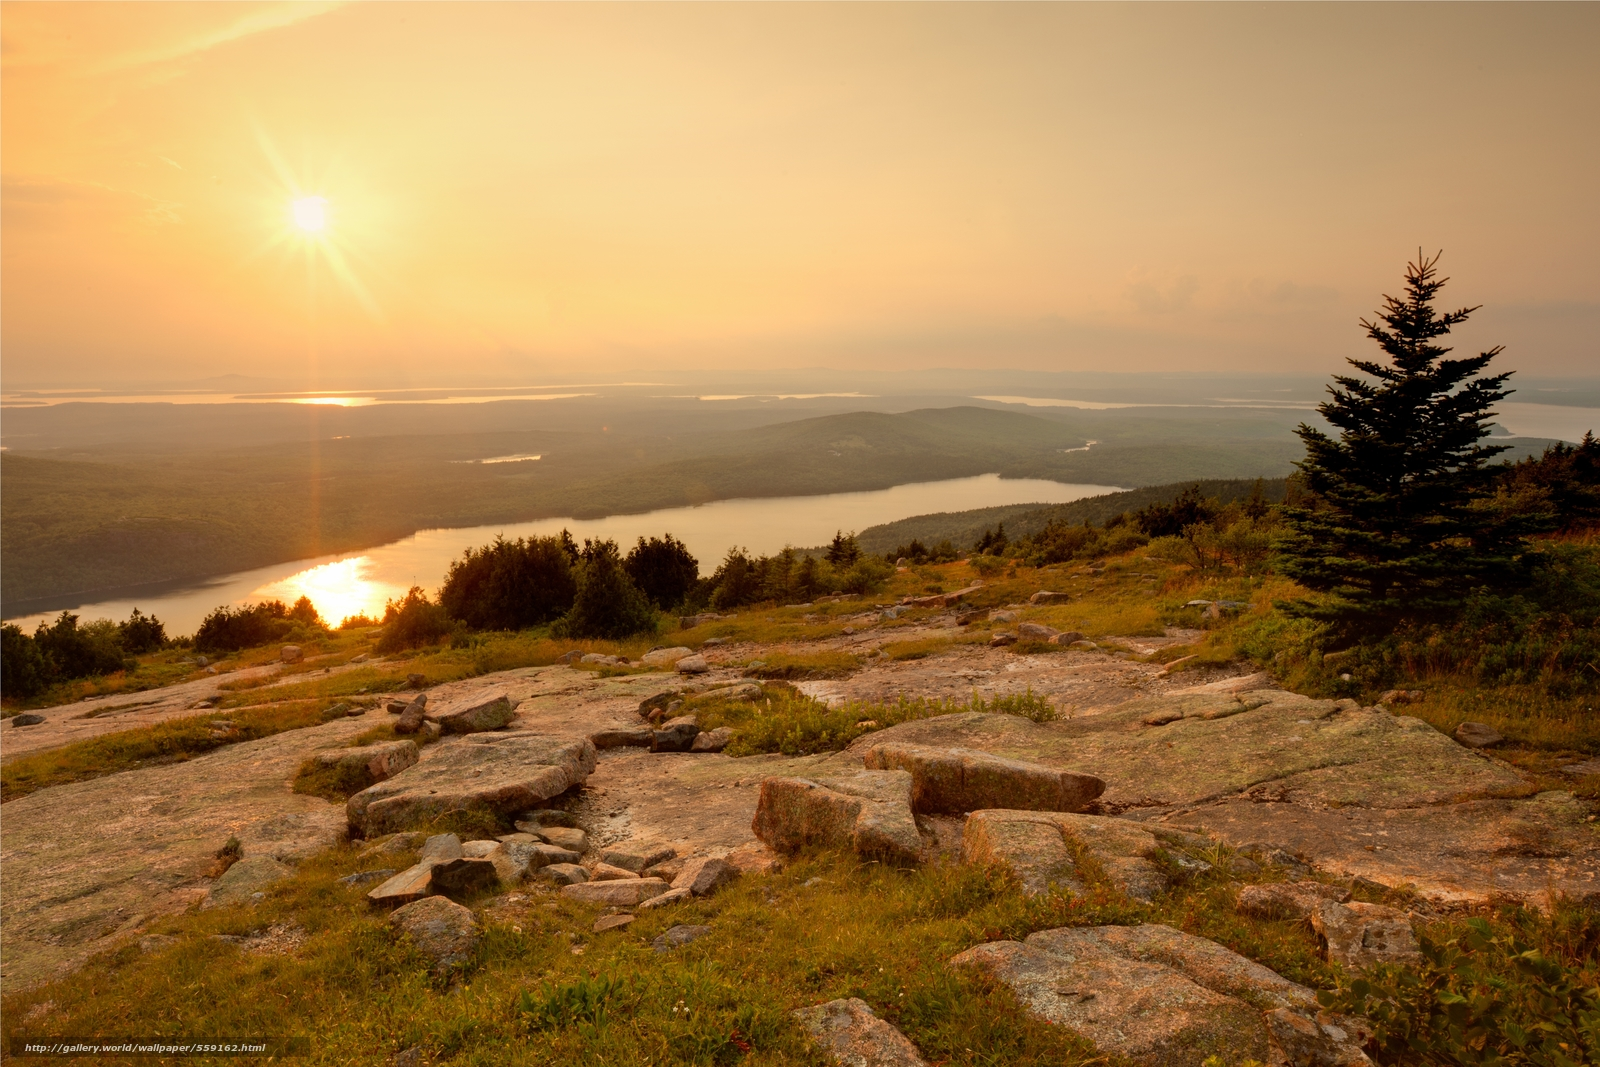 wallpaper Acadia National Park Maine USA desktop wallpaper 1600x1067